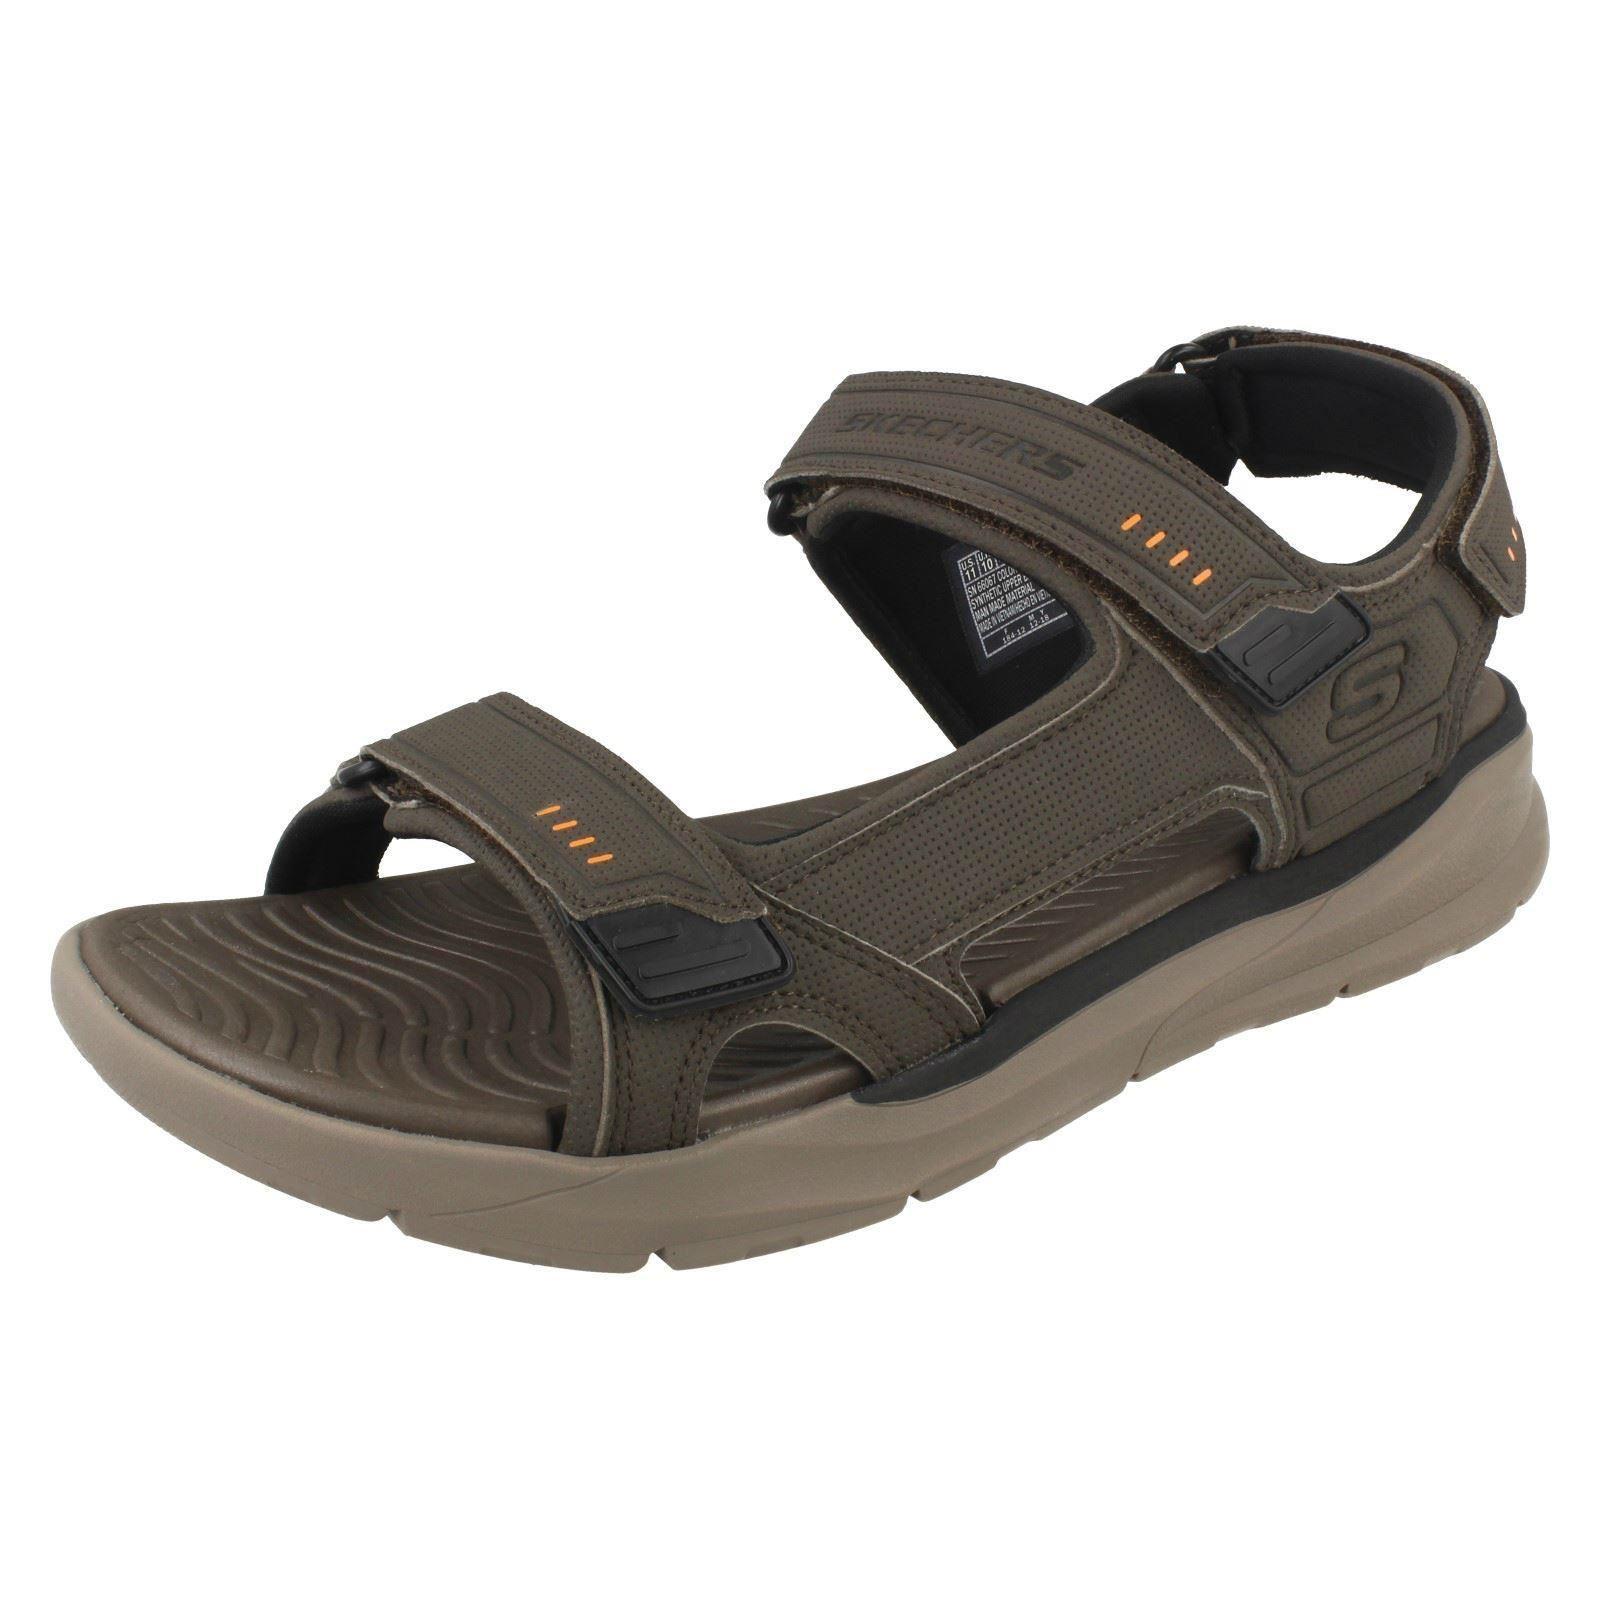 Details zu 'Mens Skechers' Relaxed Fit Memory Foam Sandals SencoSenco